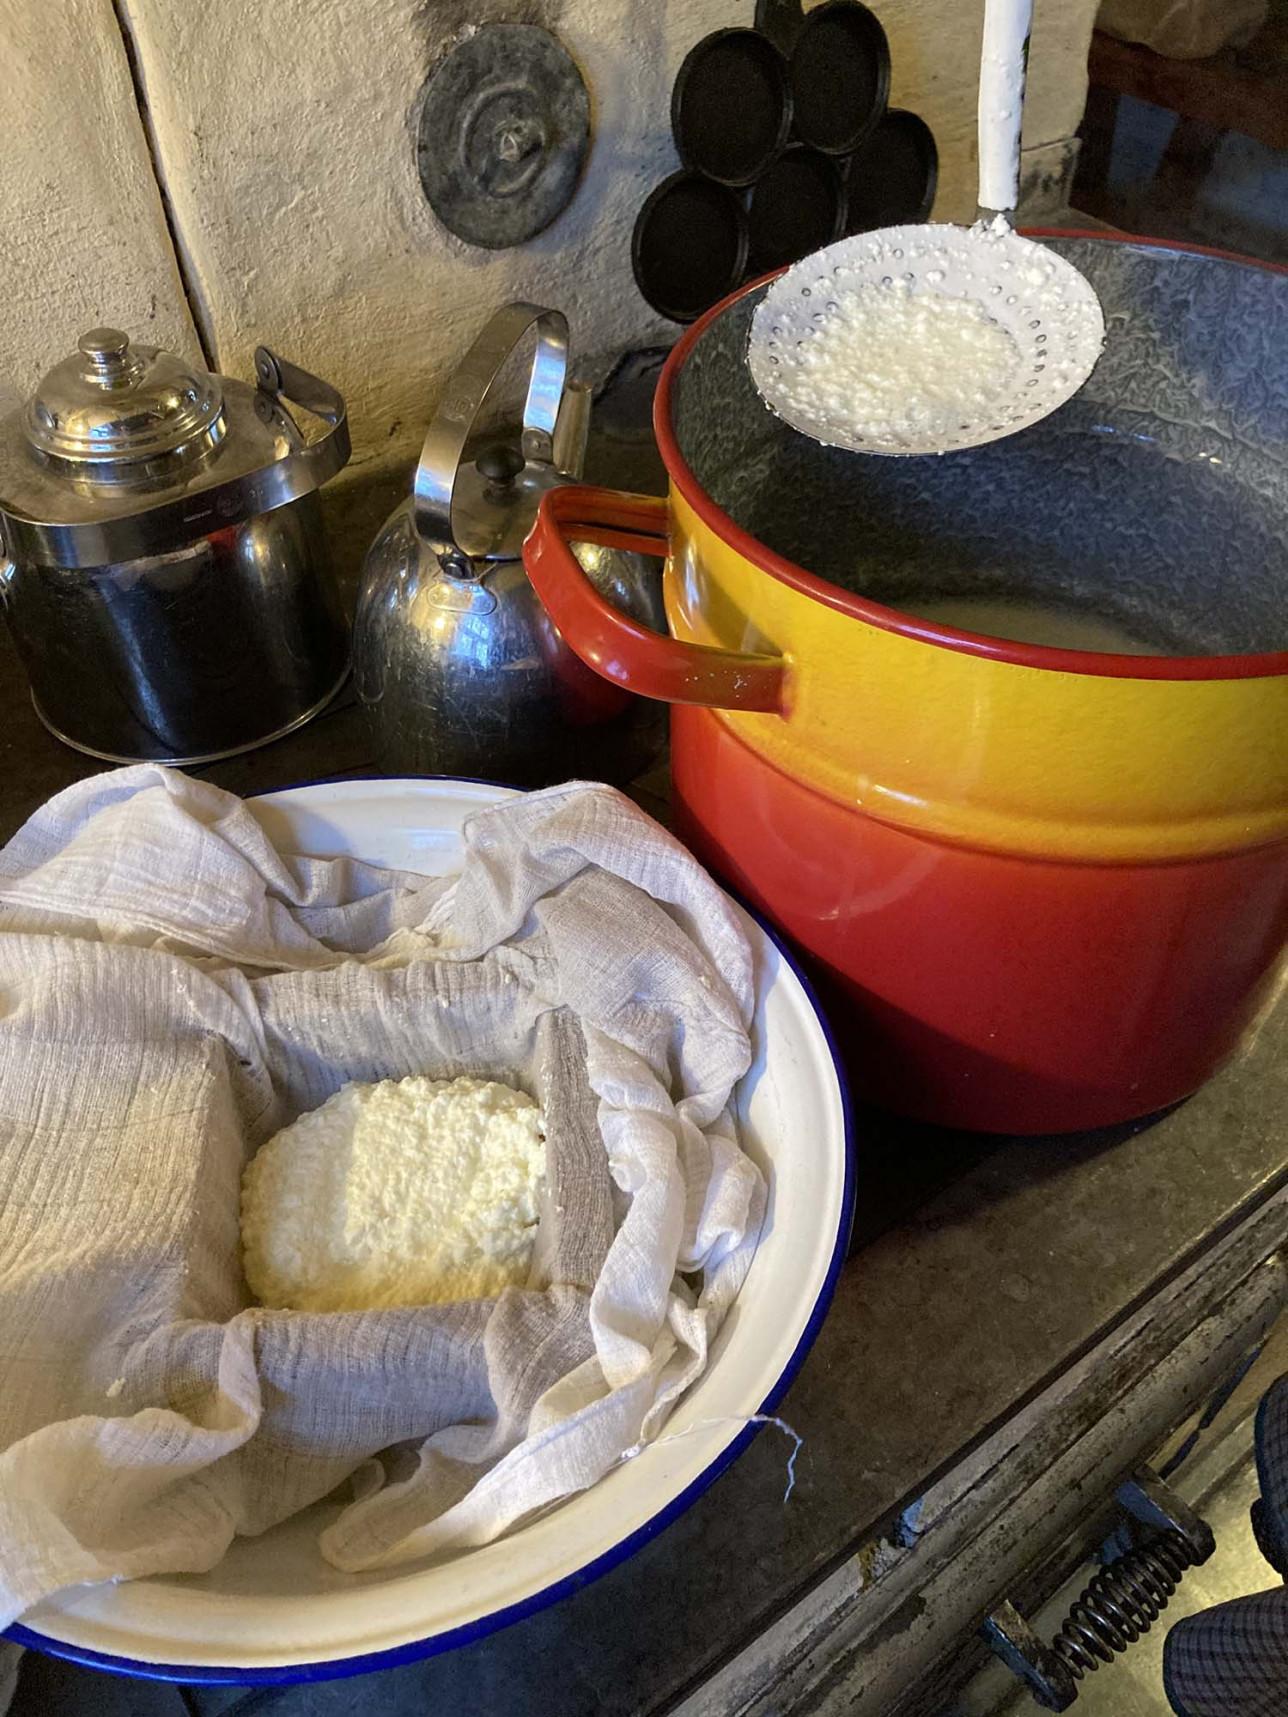 Munajuuston valmistus